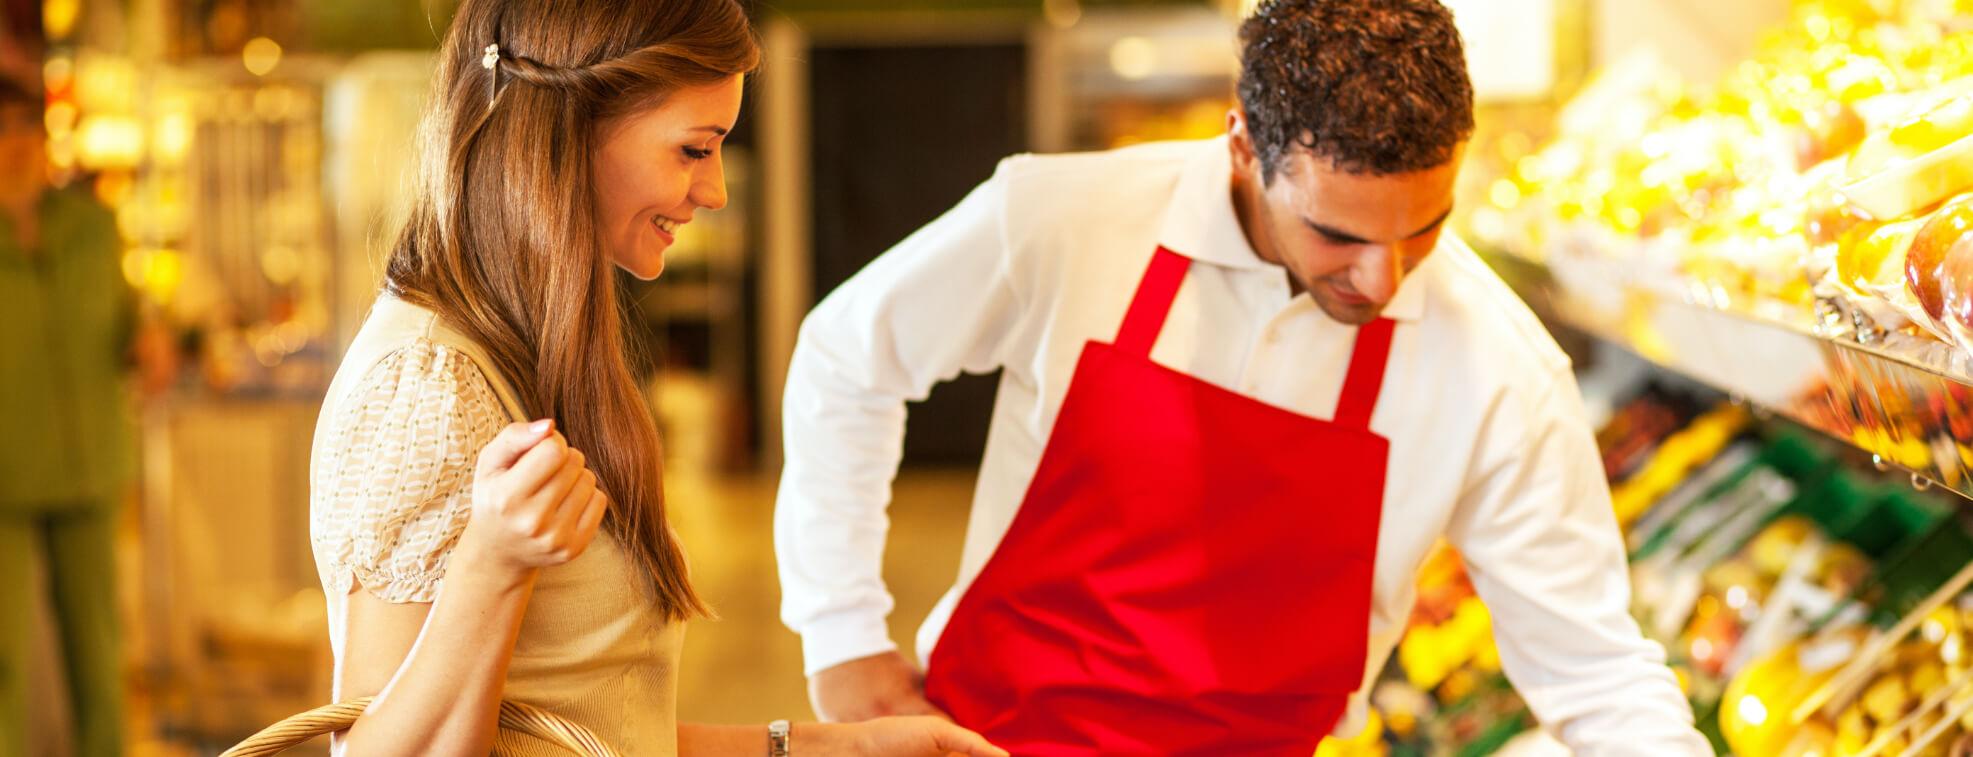 Gain Customers' Loyalty